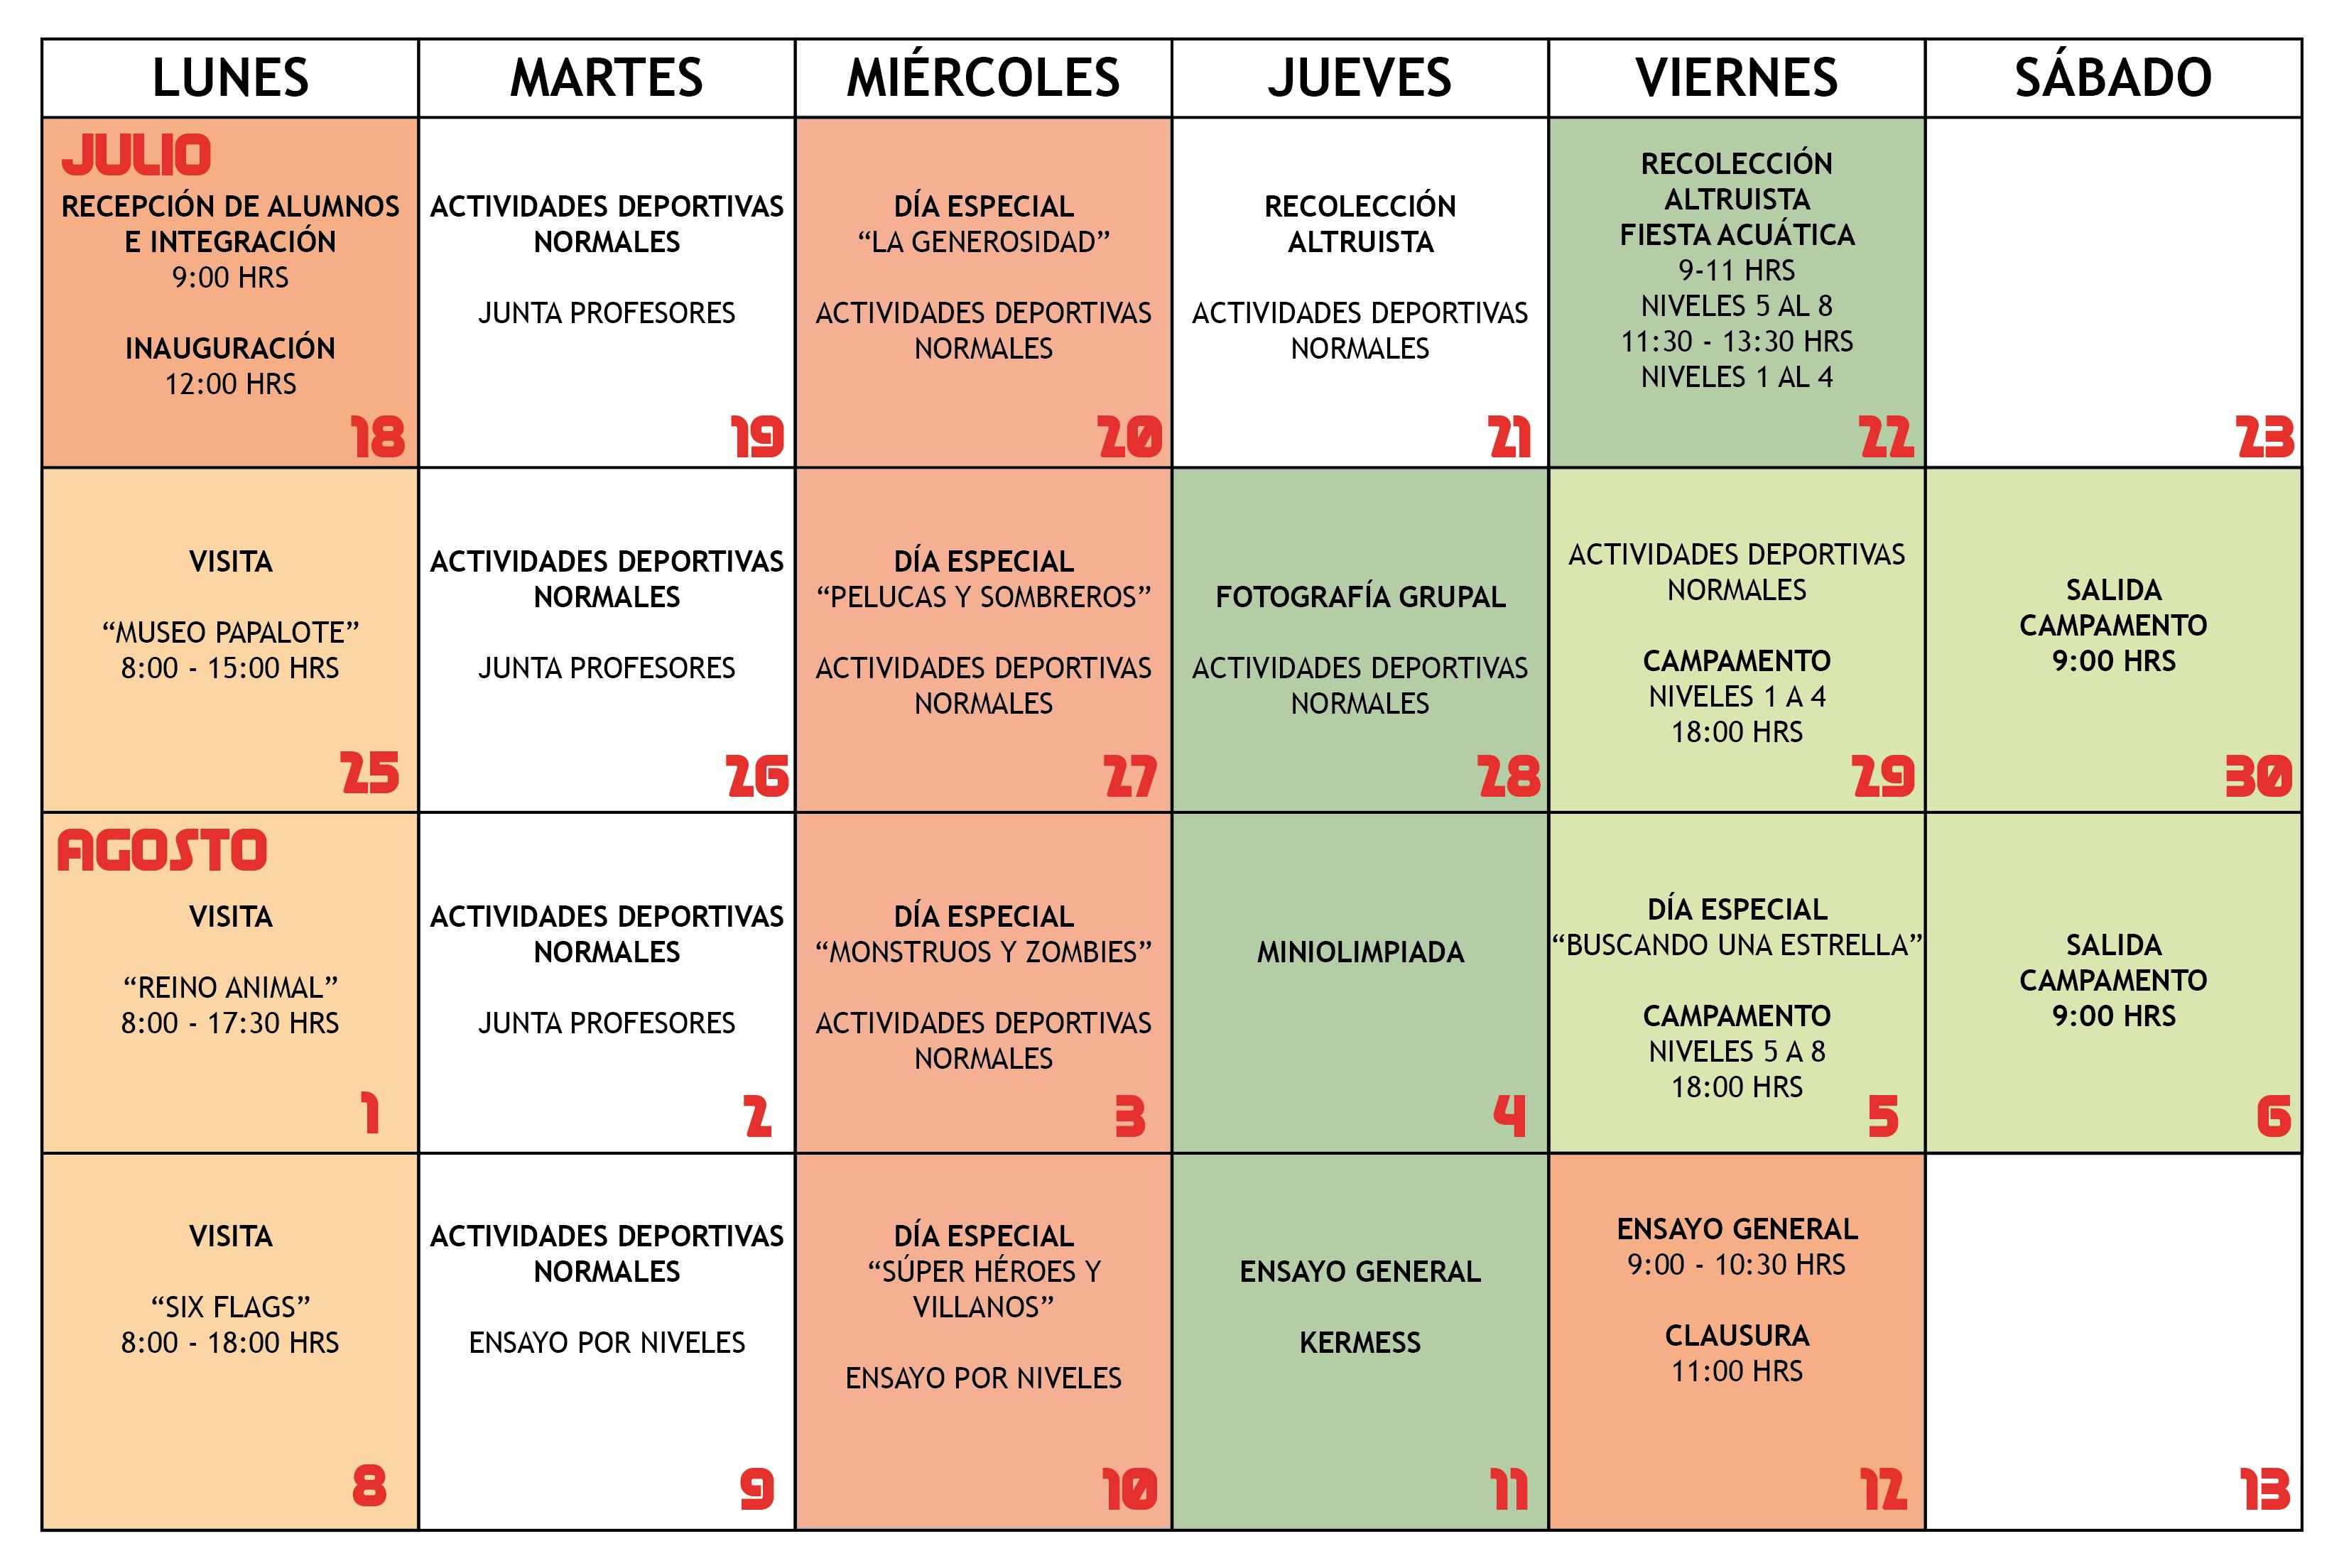 Resultado de imagen para calendario de actividades